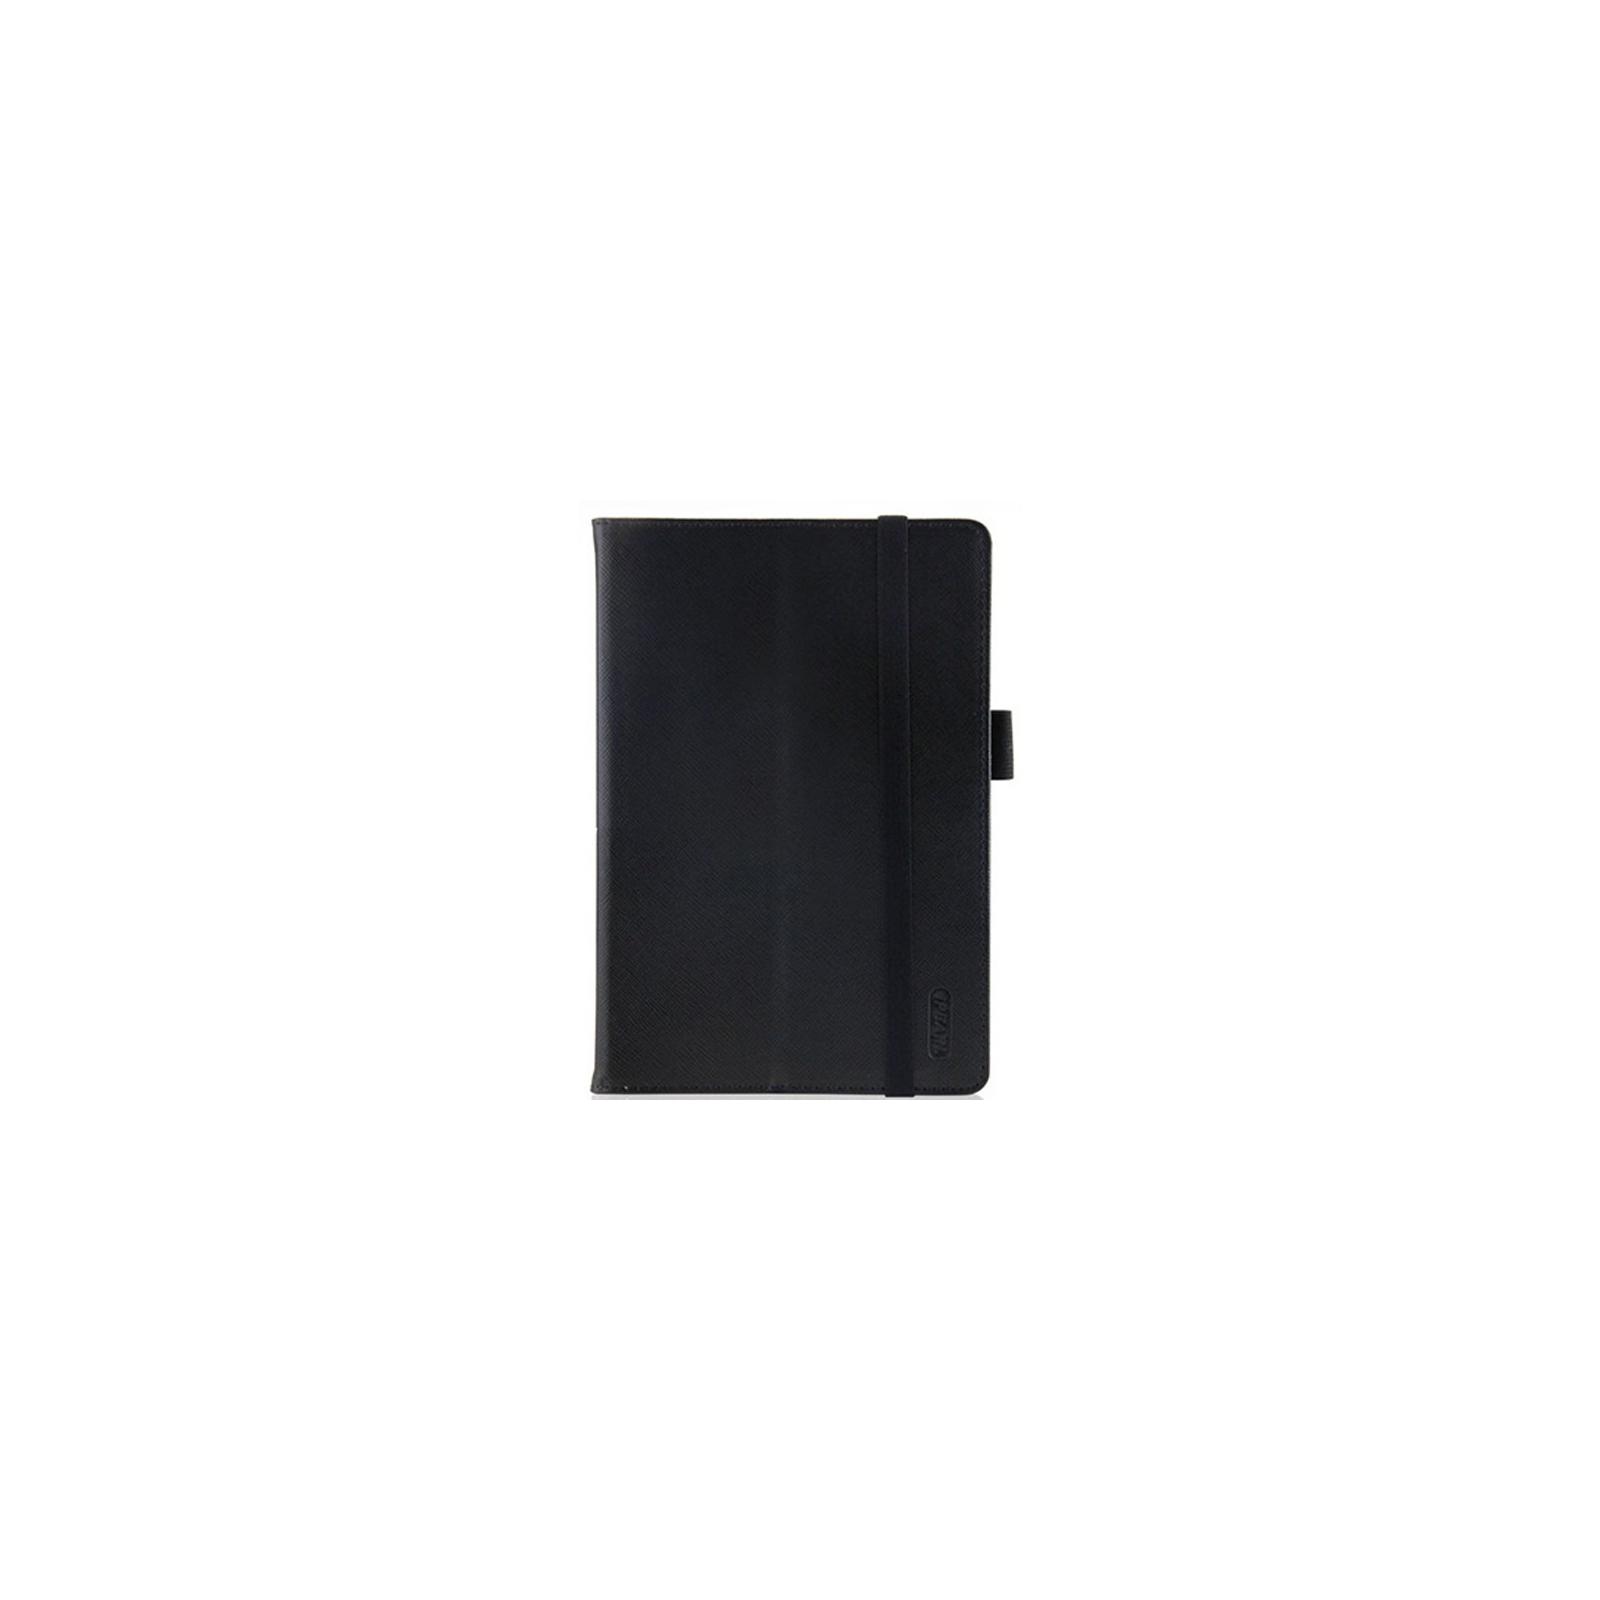 "Чехол для планшета iPearl 7,9"" iPad Mini black (PCUT5TW)"